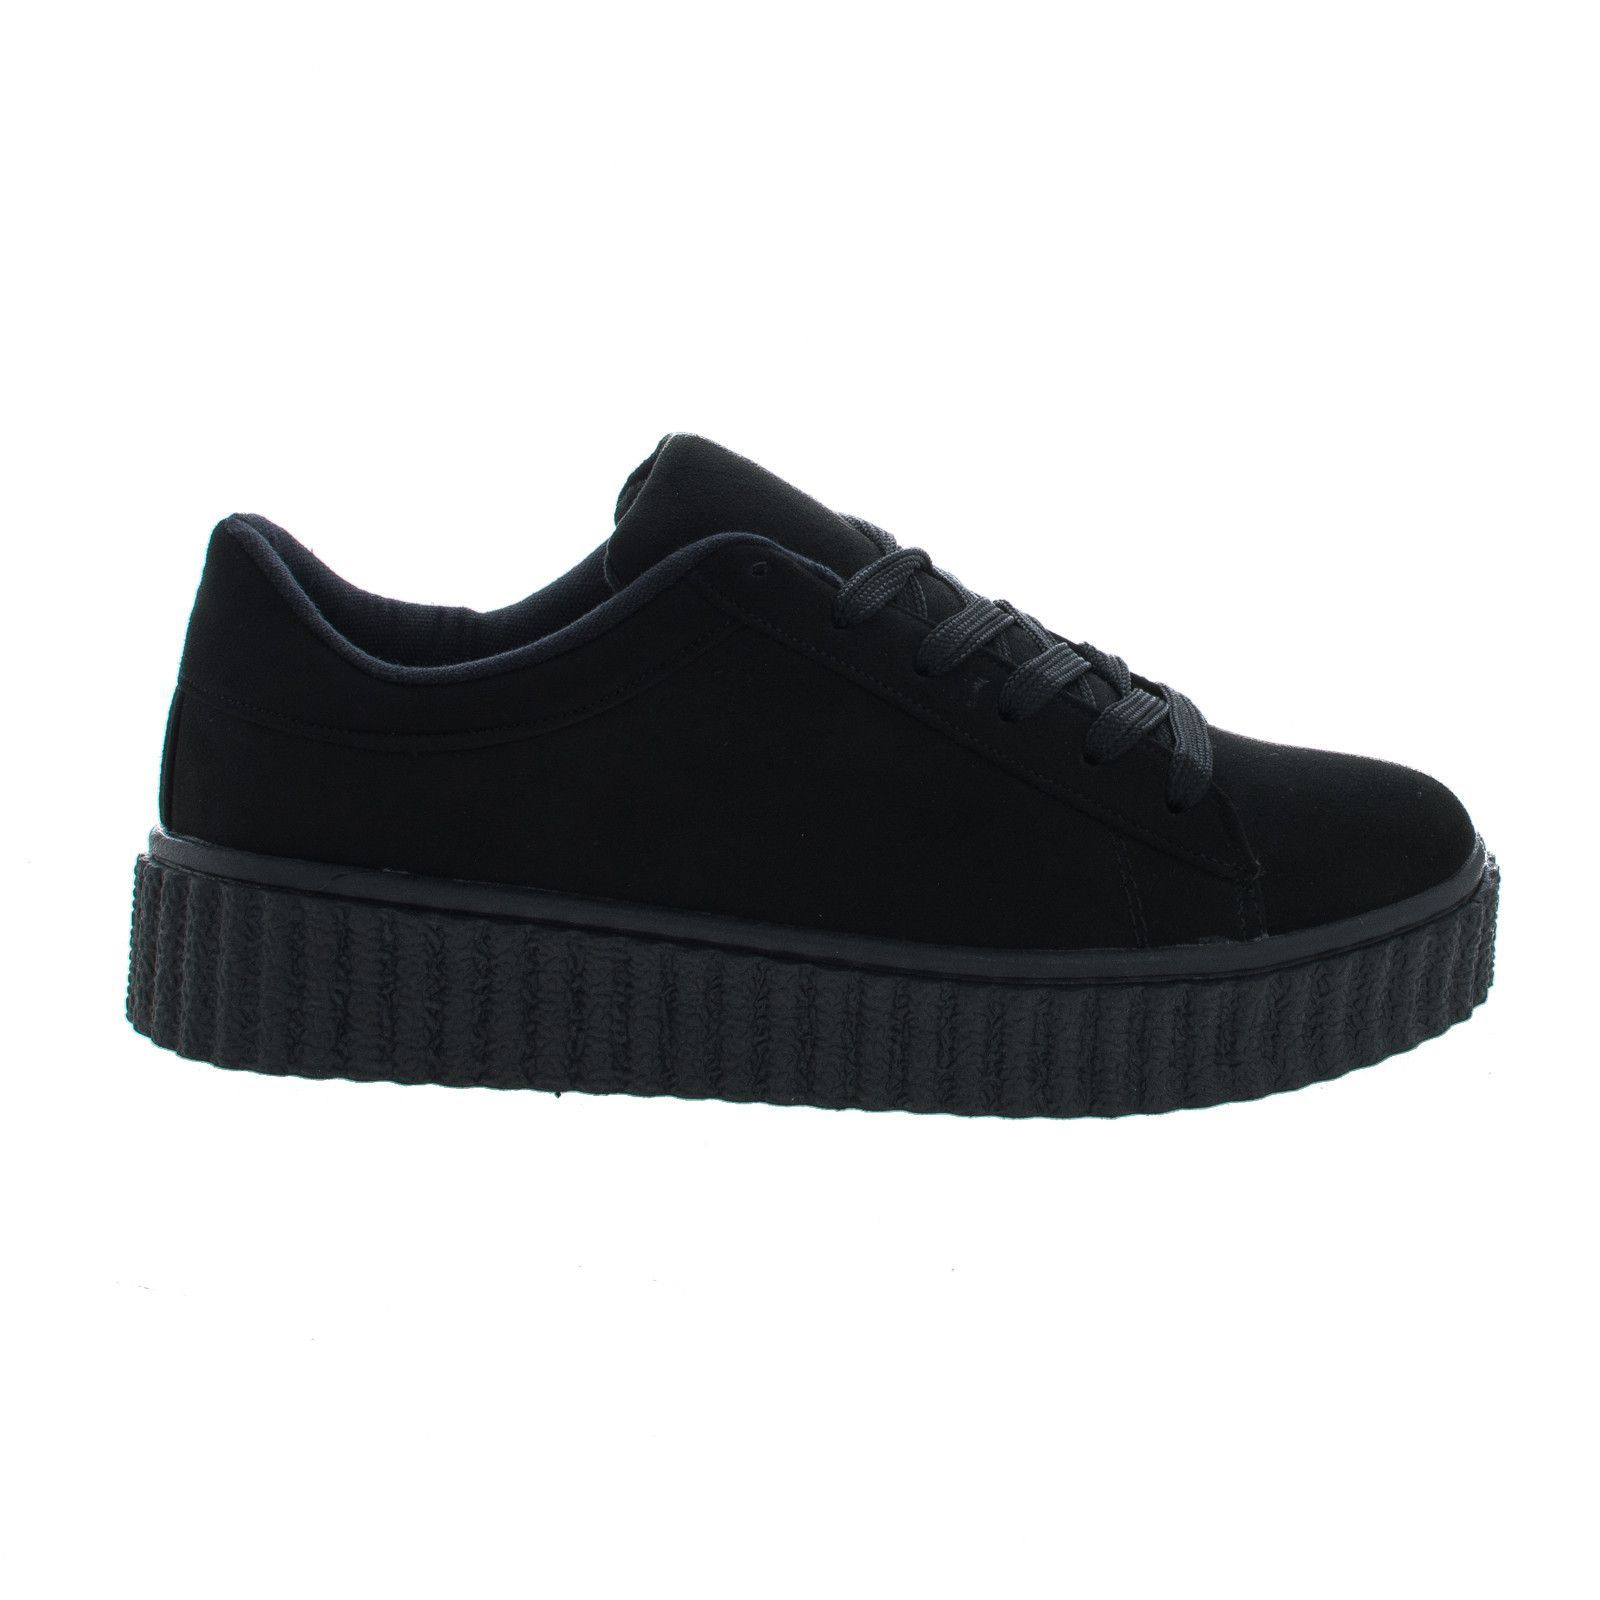 7e56a6a8ae Caleb02 Black Suede Lace Up Sneaker w Rubber Texture Ridges Thick Platform  Sole